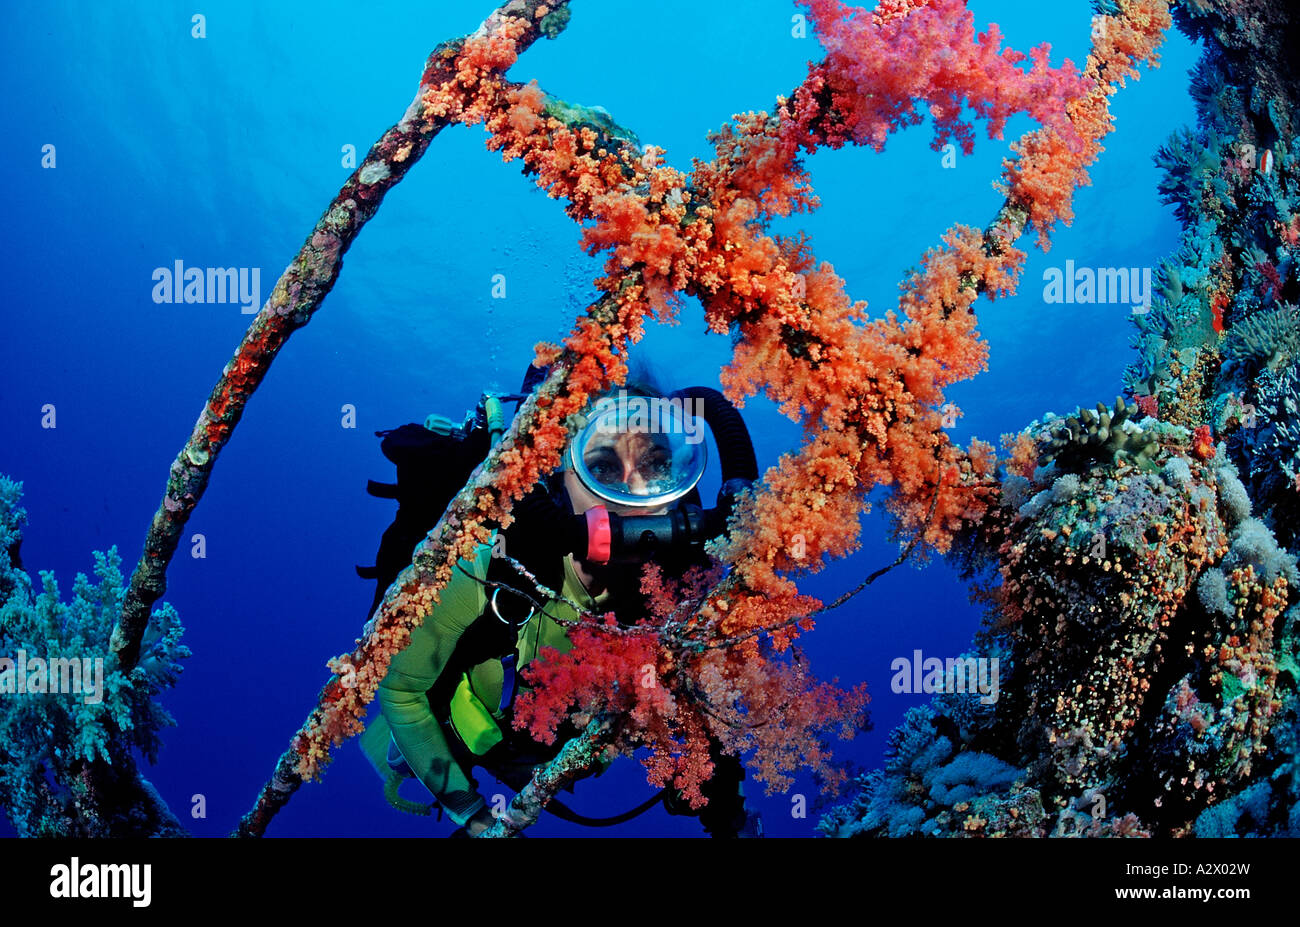 Scuba diver exploring the shipwreck Aida Egypt Africa Red Sea - Stock Image